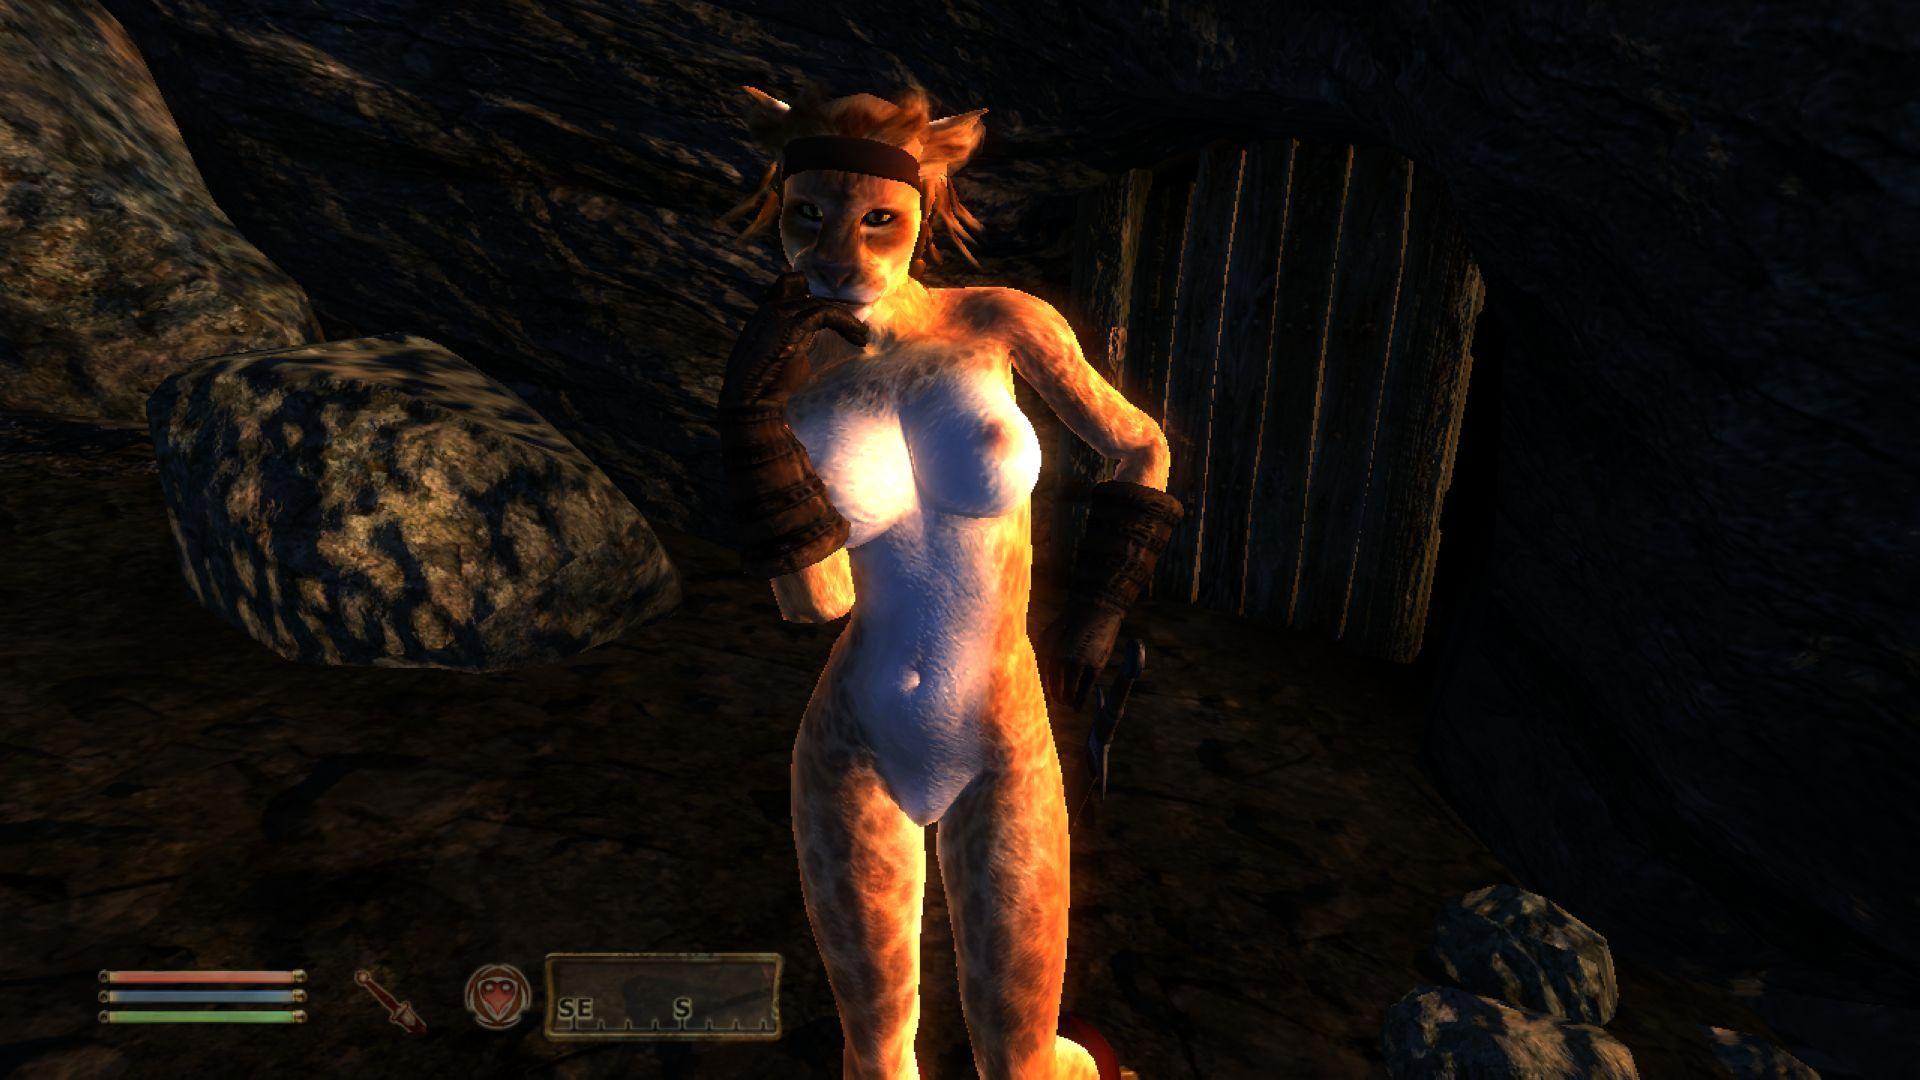 Free nude pics of oblivion